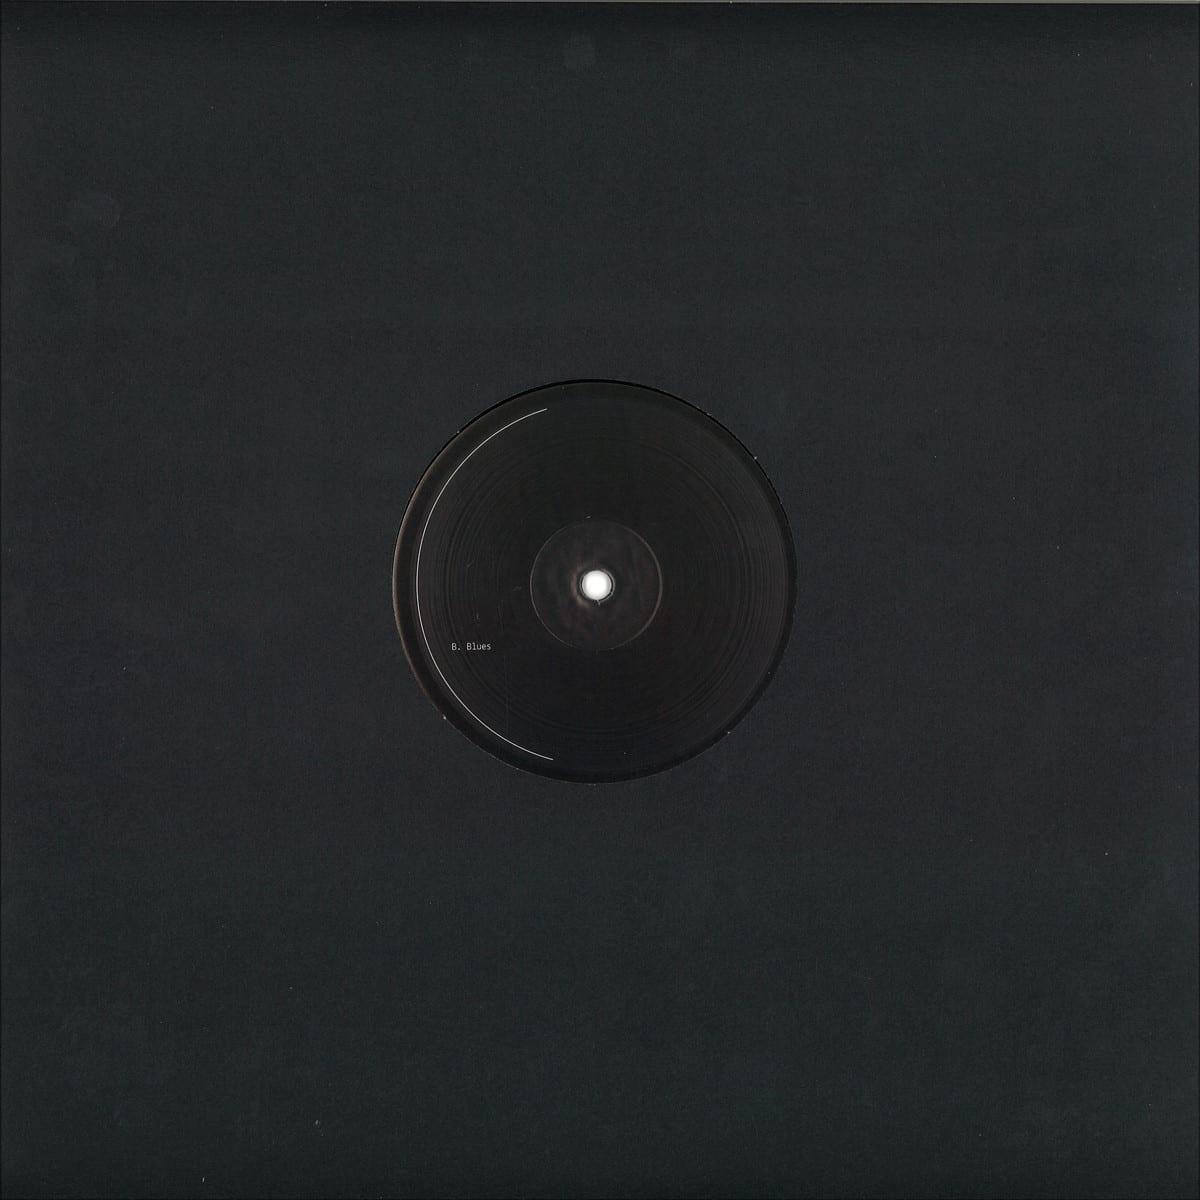 arapu - atipic lab 001 sleeve